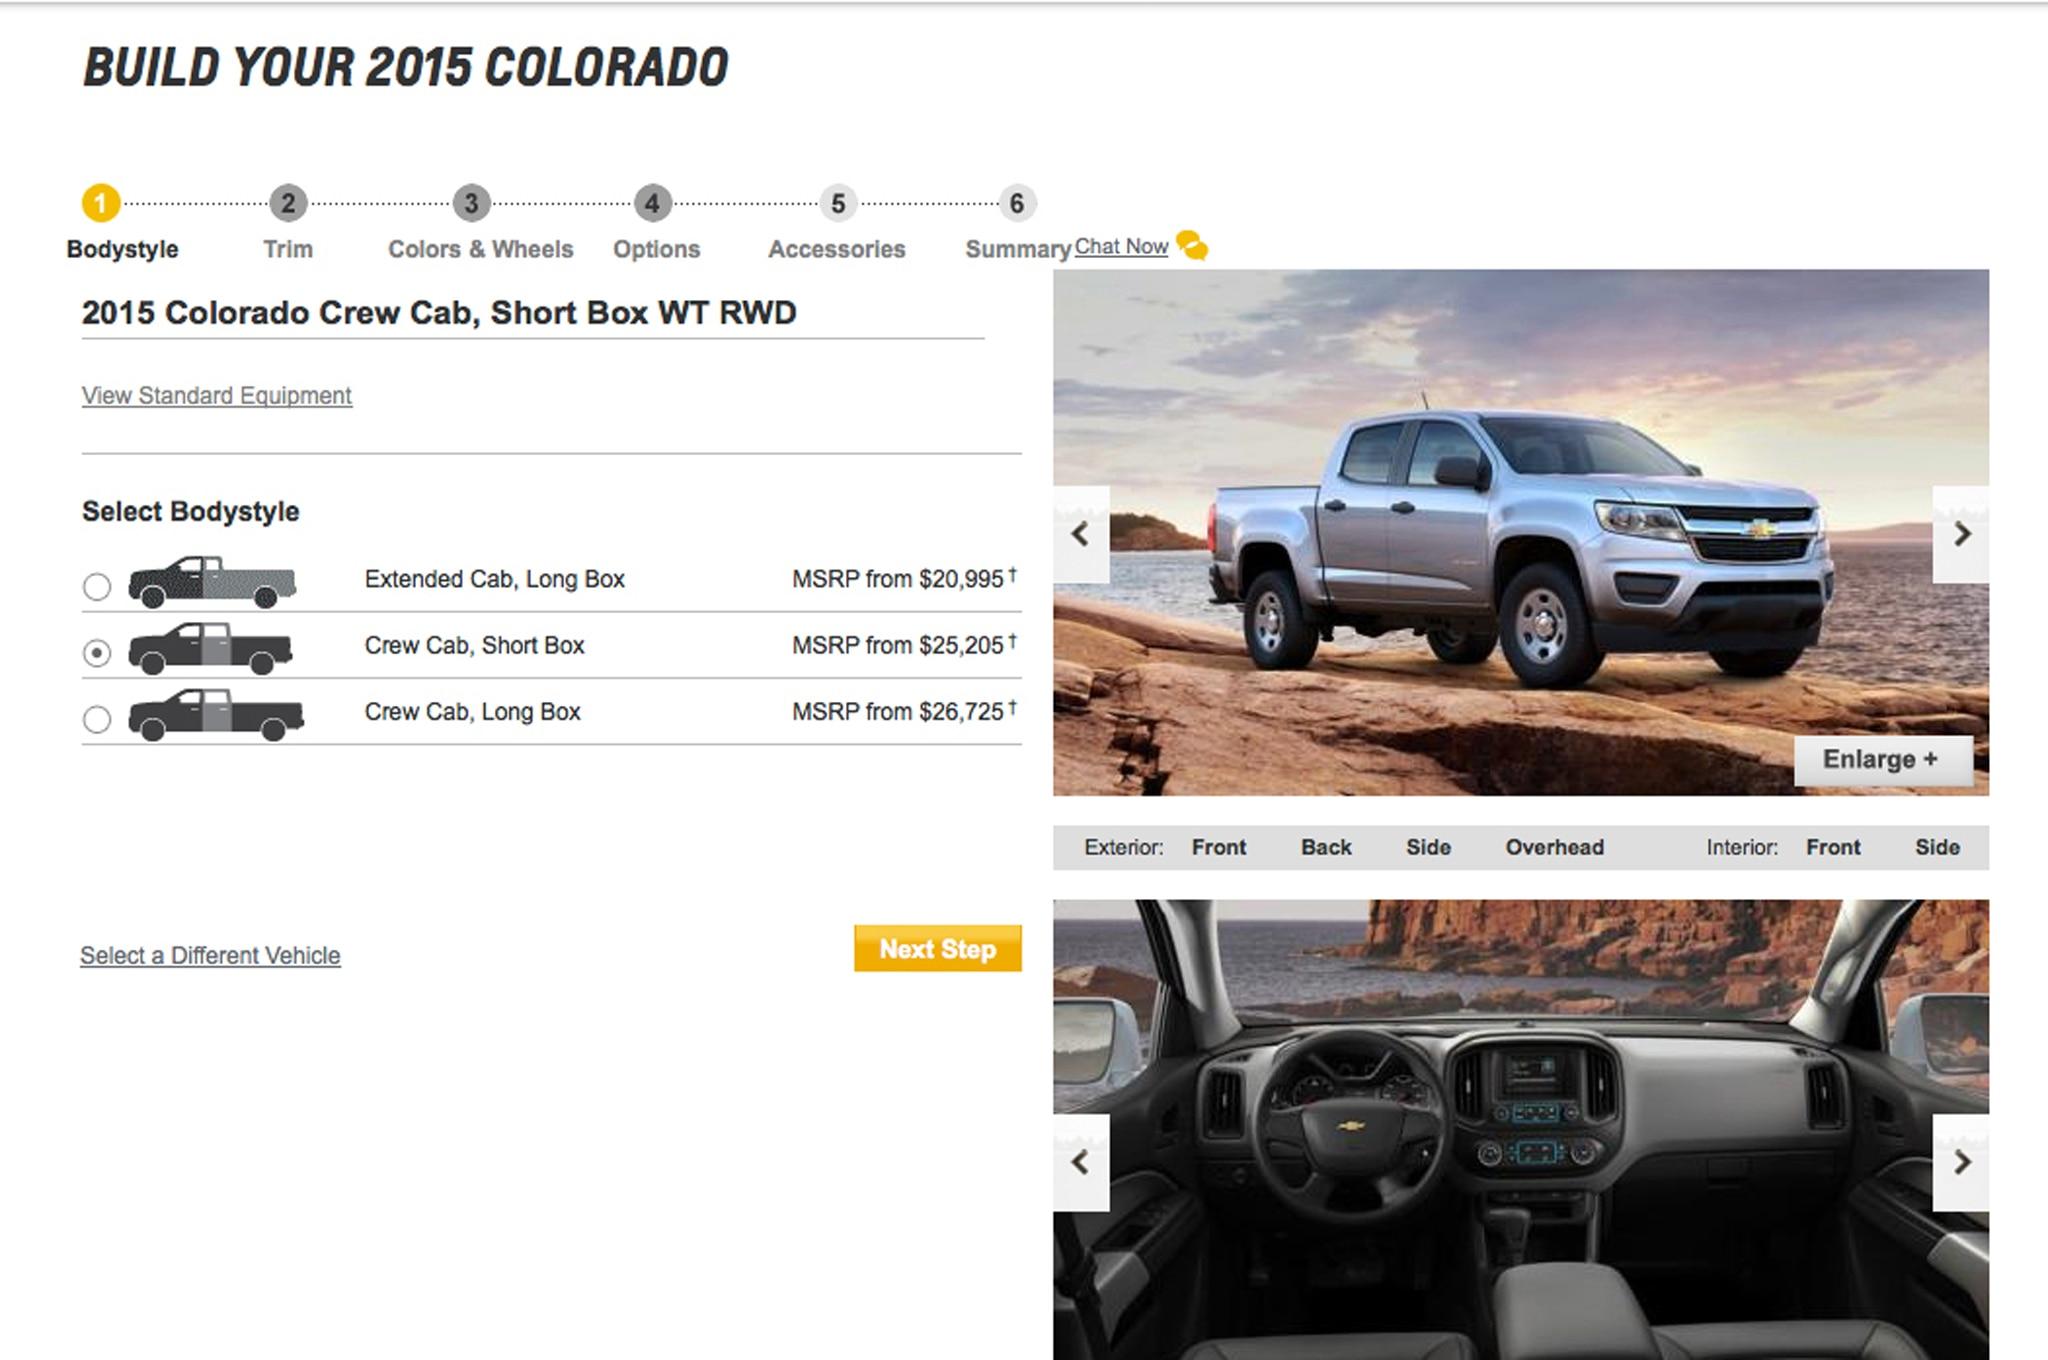 2015 Chevrolet Colorado Build Your Own